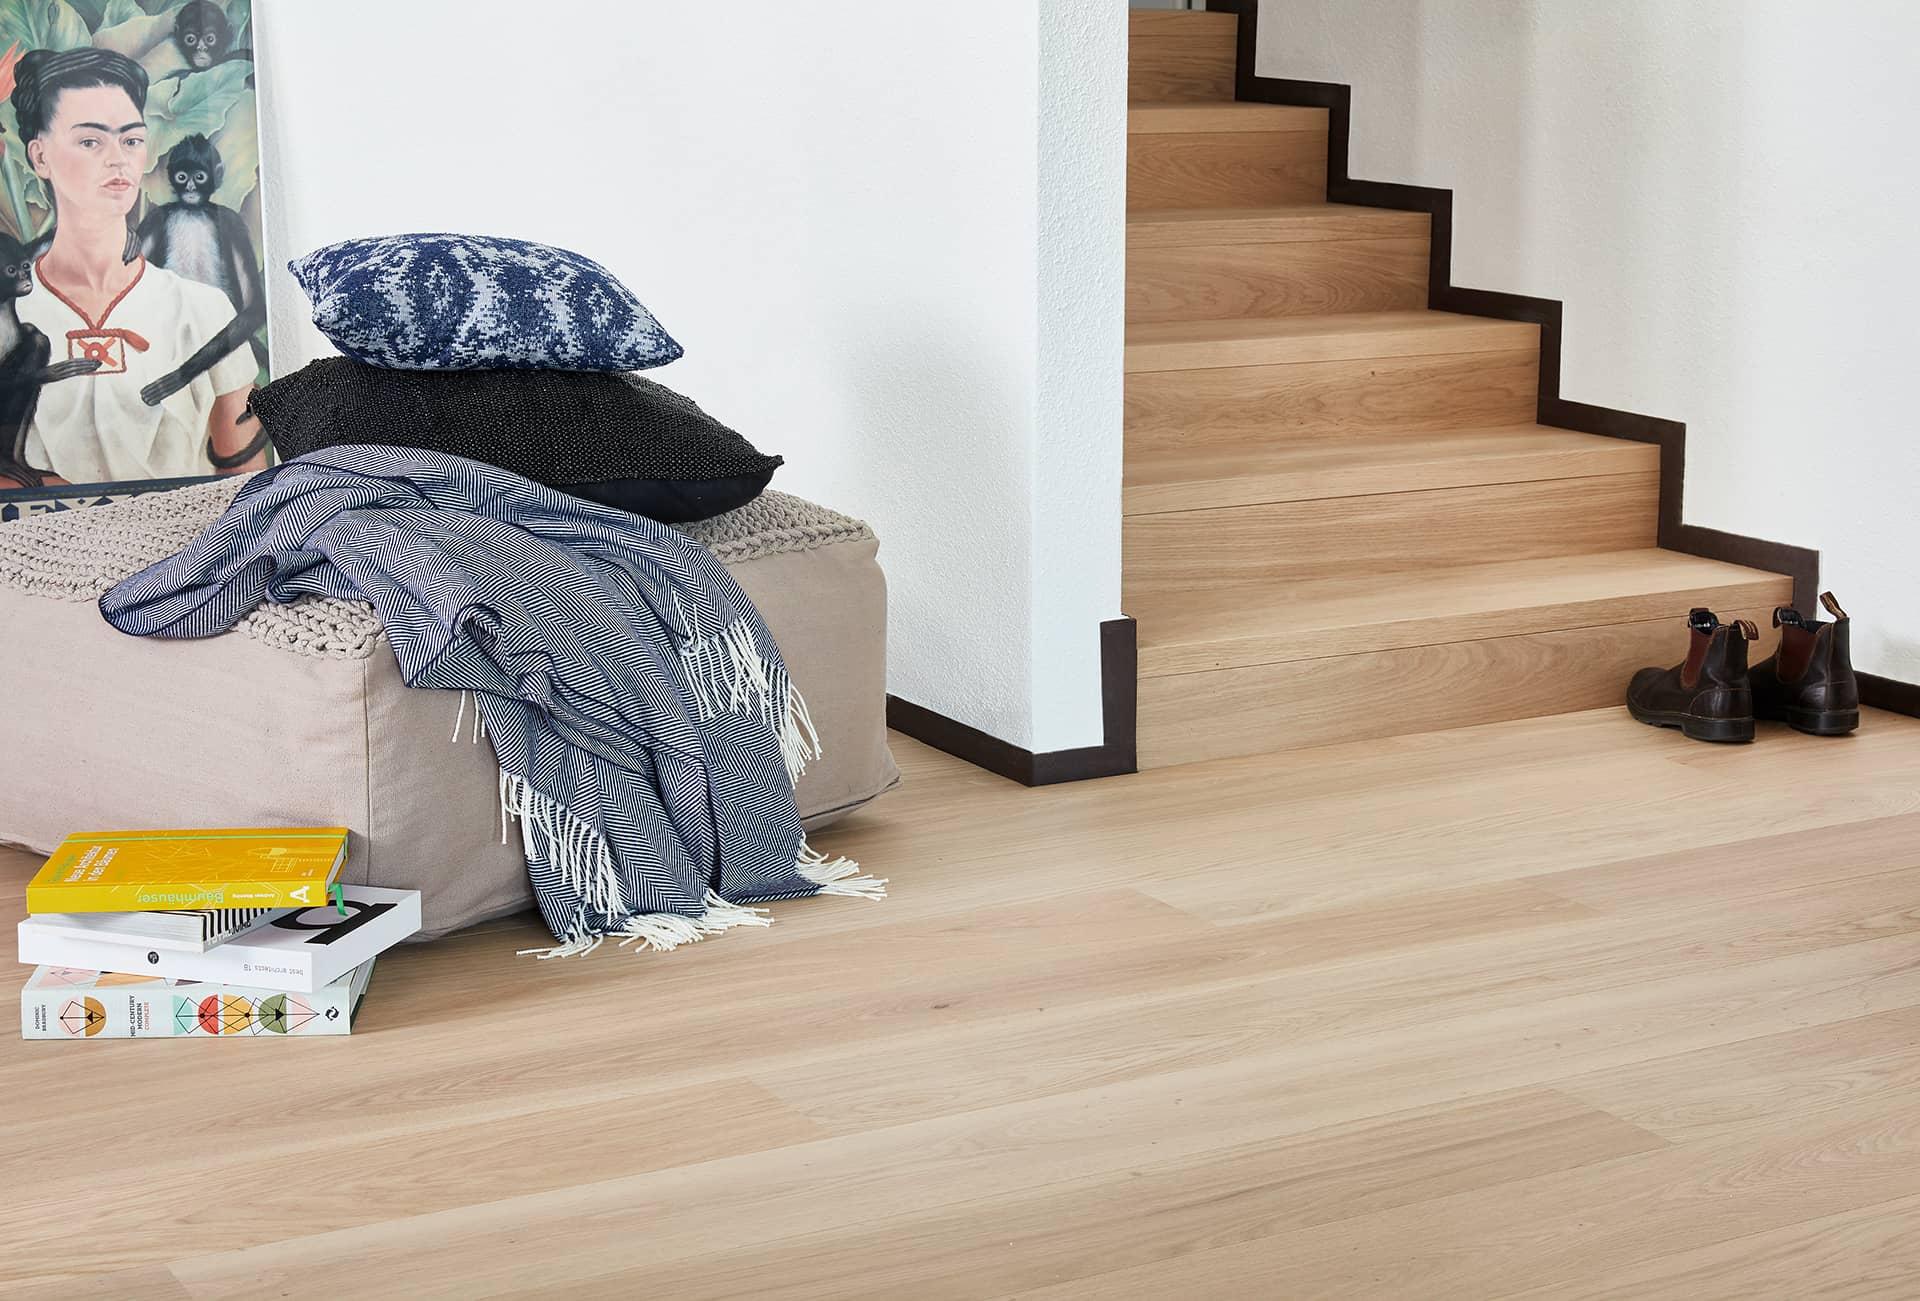 Bodenbelag aus Holz